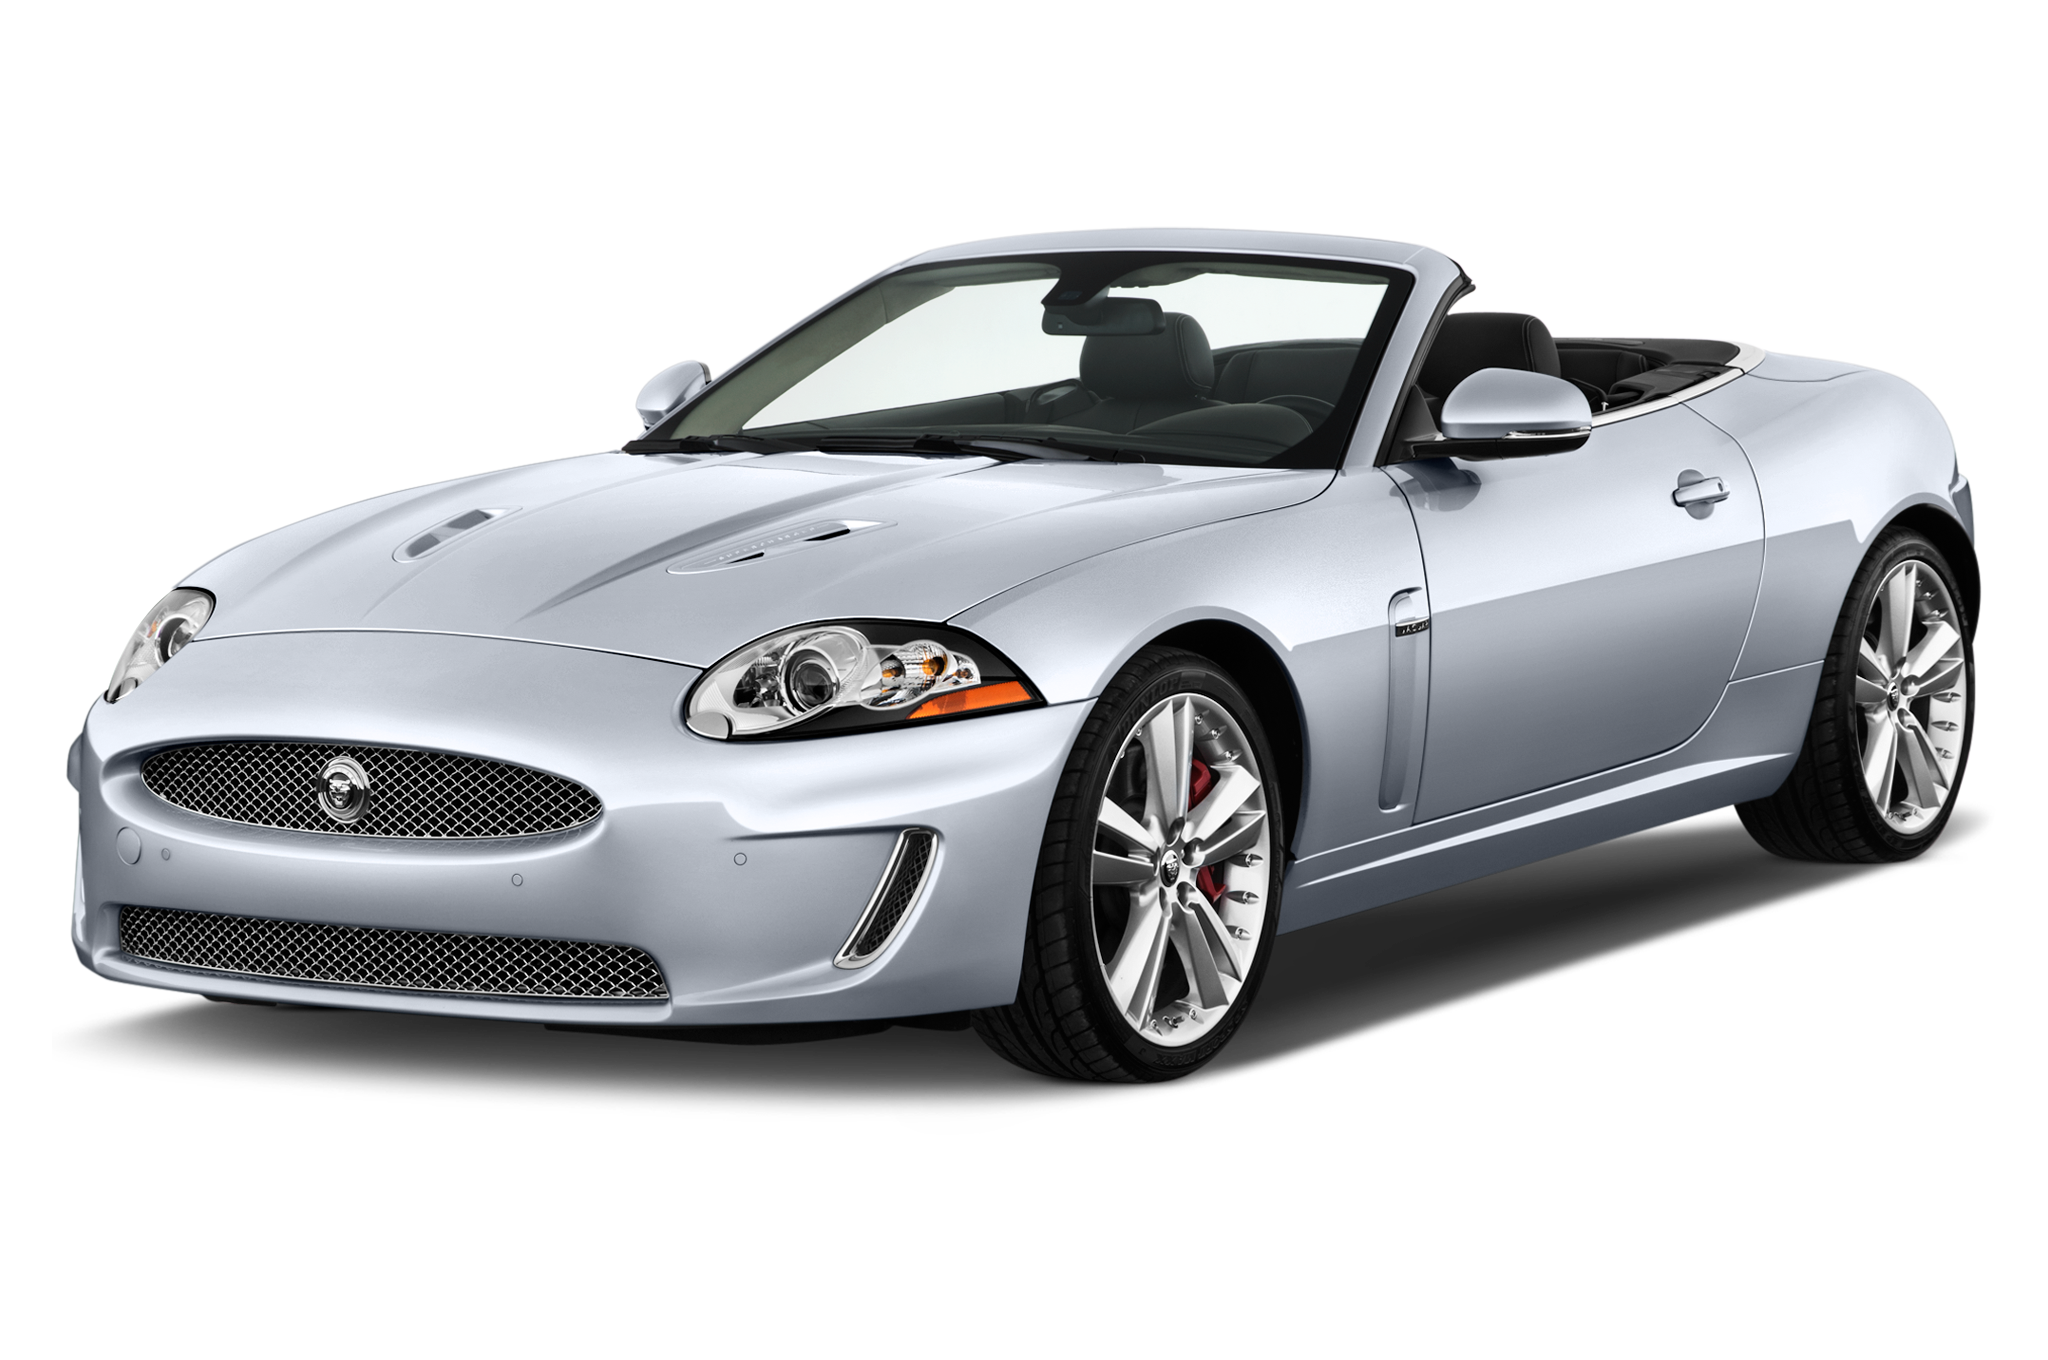 for xk grey convertible classic cars sale roadster ots cabriolet jaguar